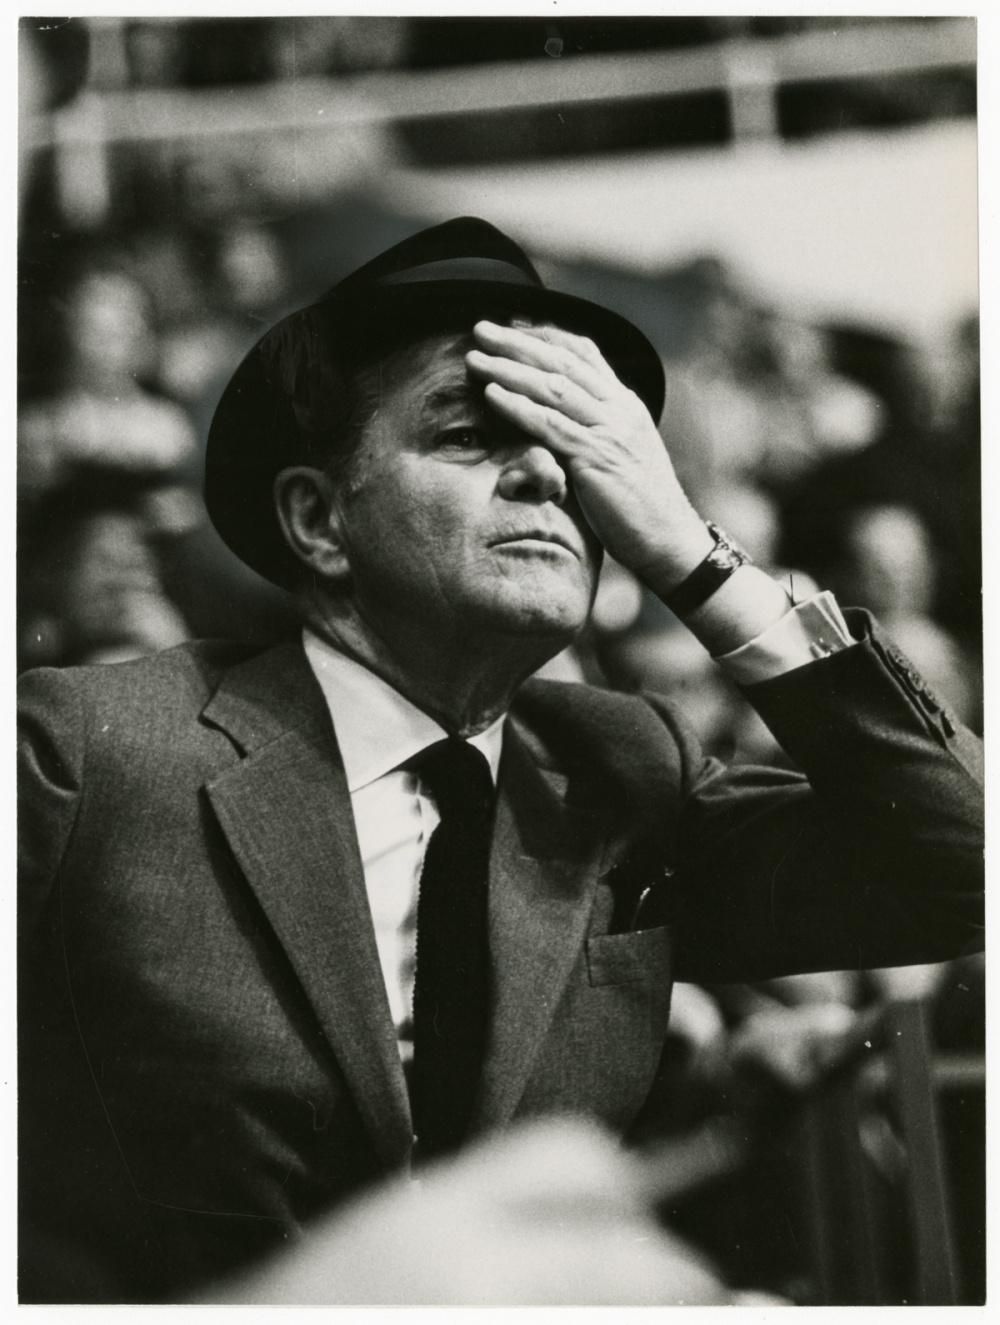 Fred Ross, Jack Kent Cooke, sports team owner, 1967. Gelatin silver print, 9 x 7